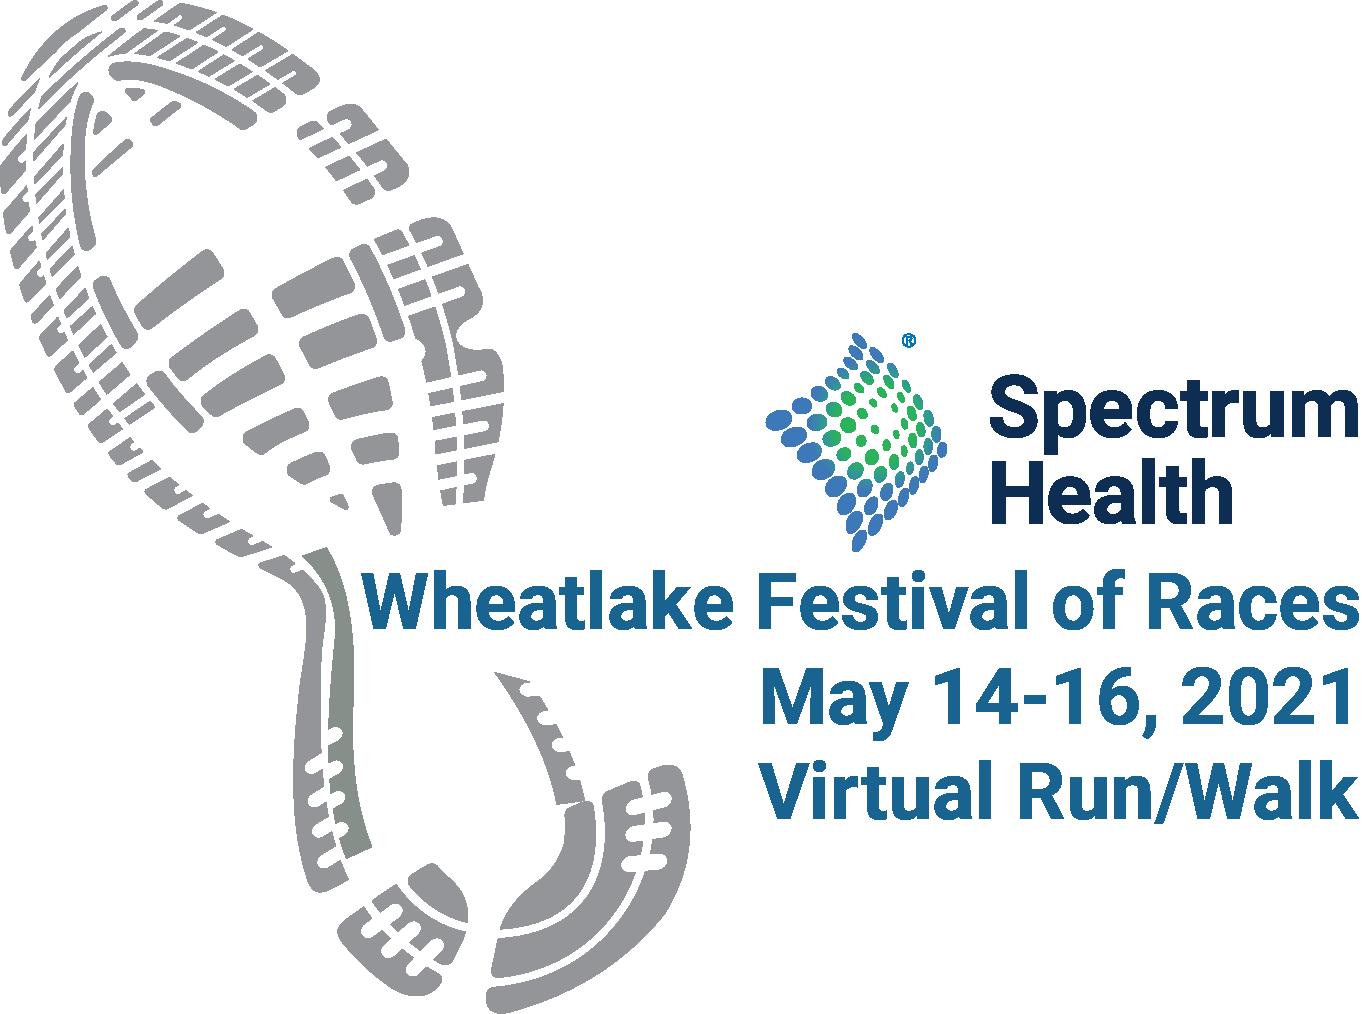 Wheatlake Races May 14-16, 2021